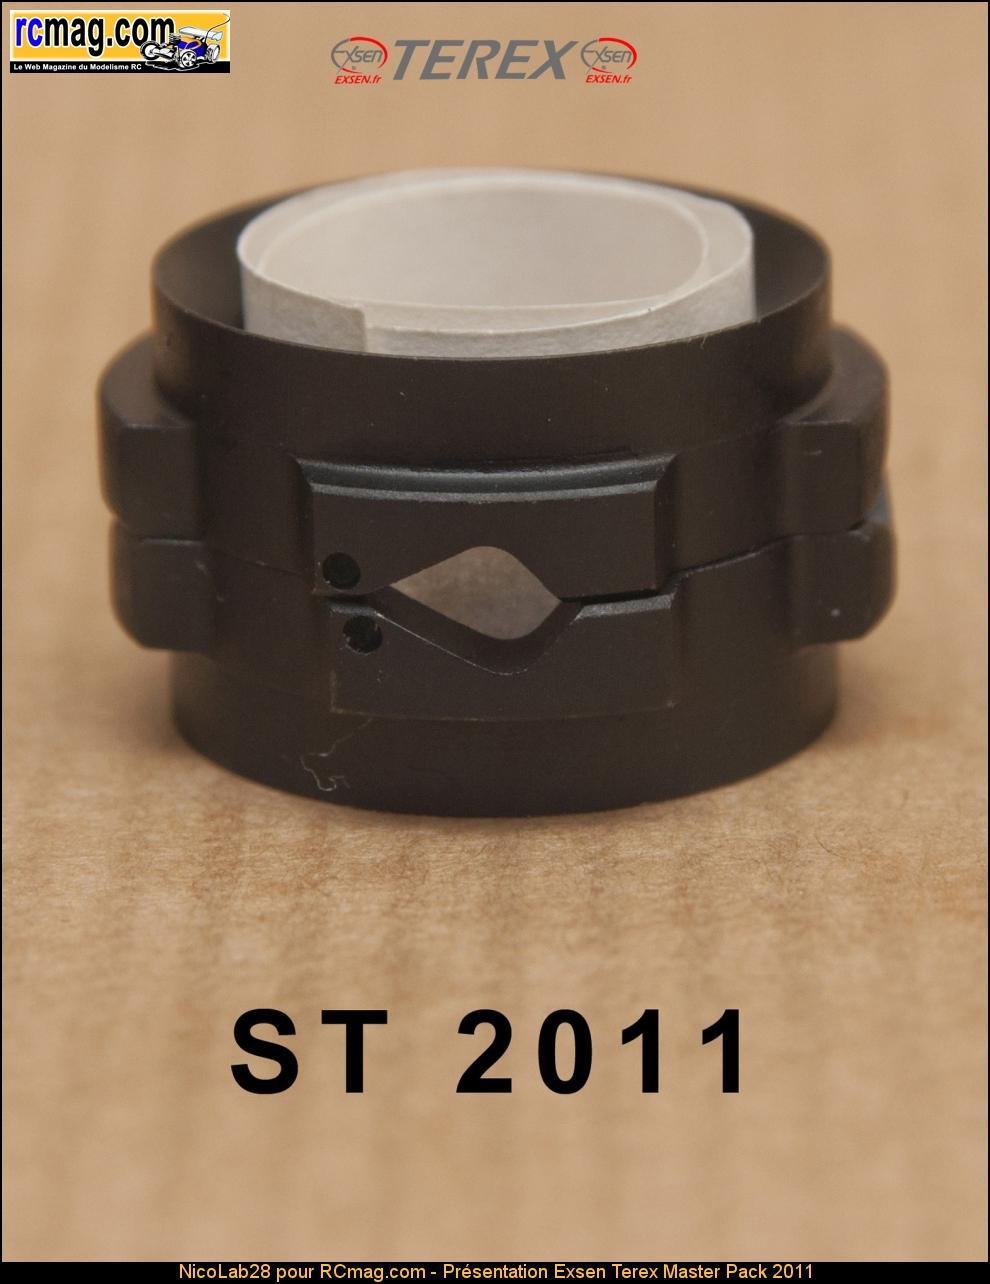 pr u00e9sentation exsen terex master pack 2011